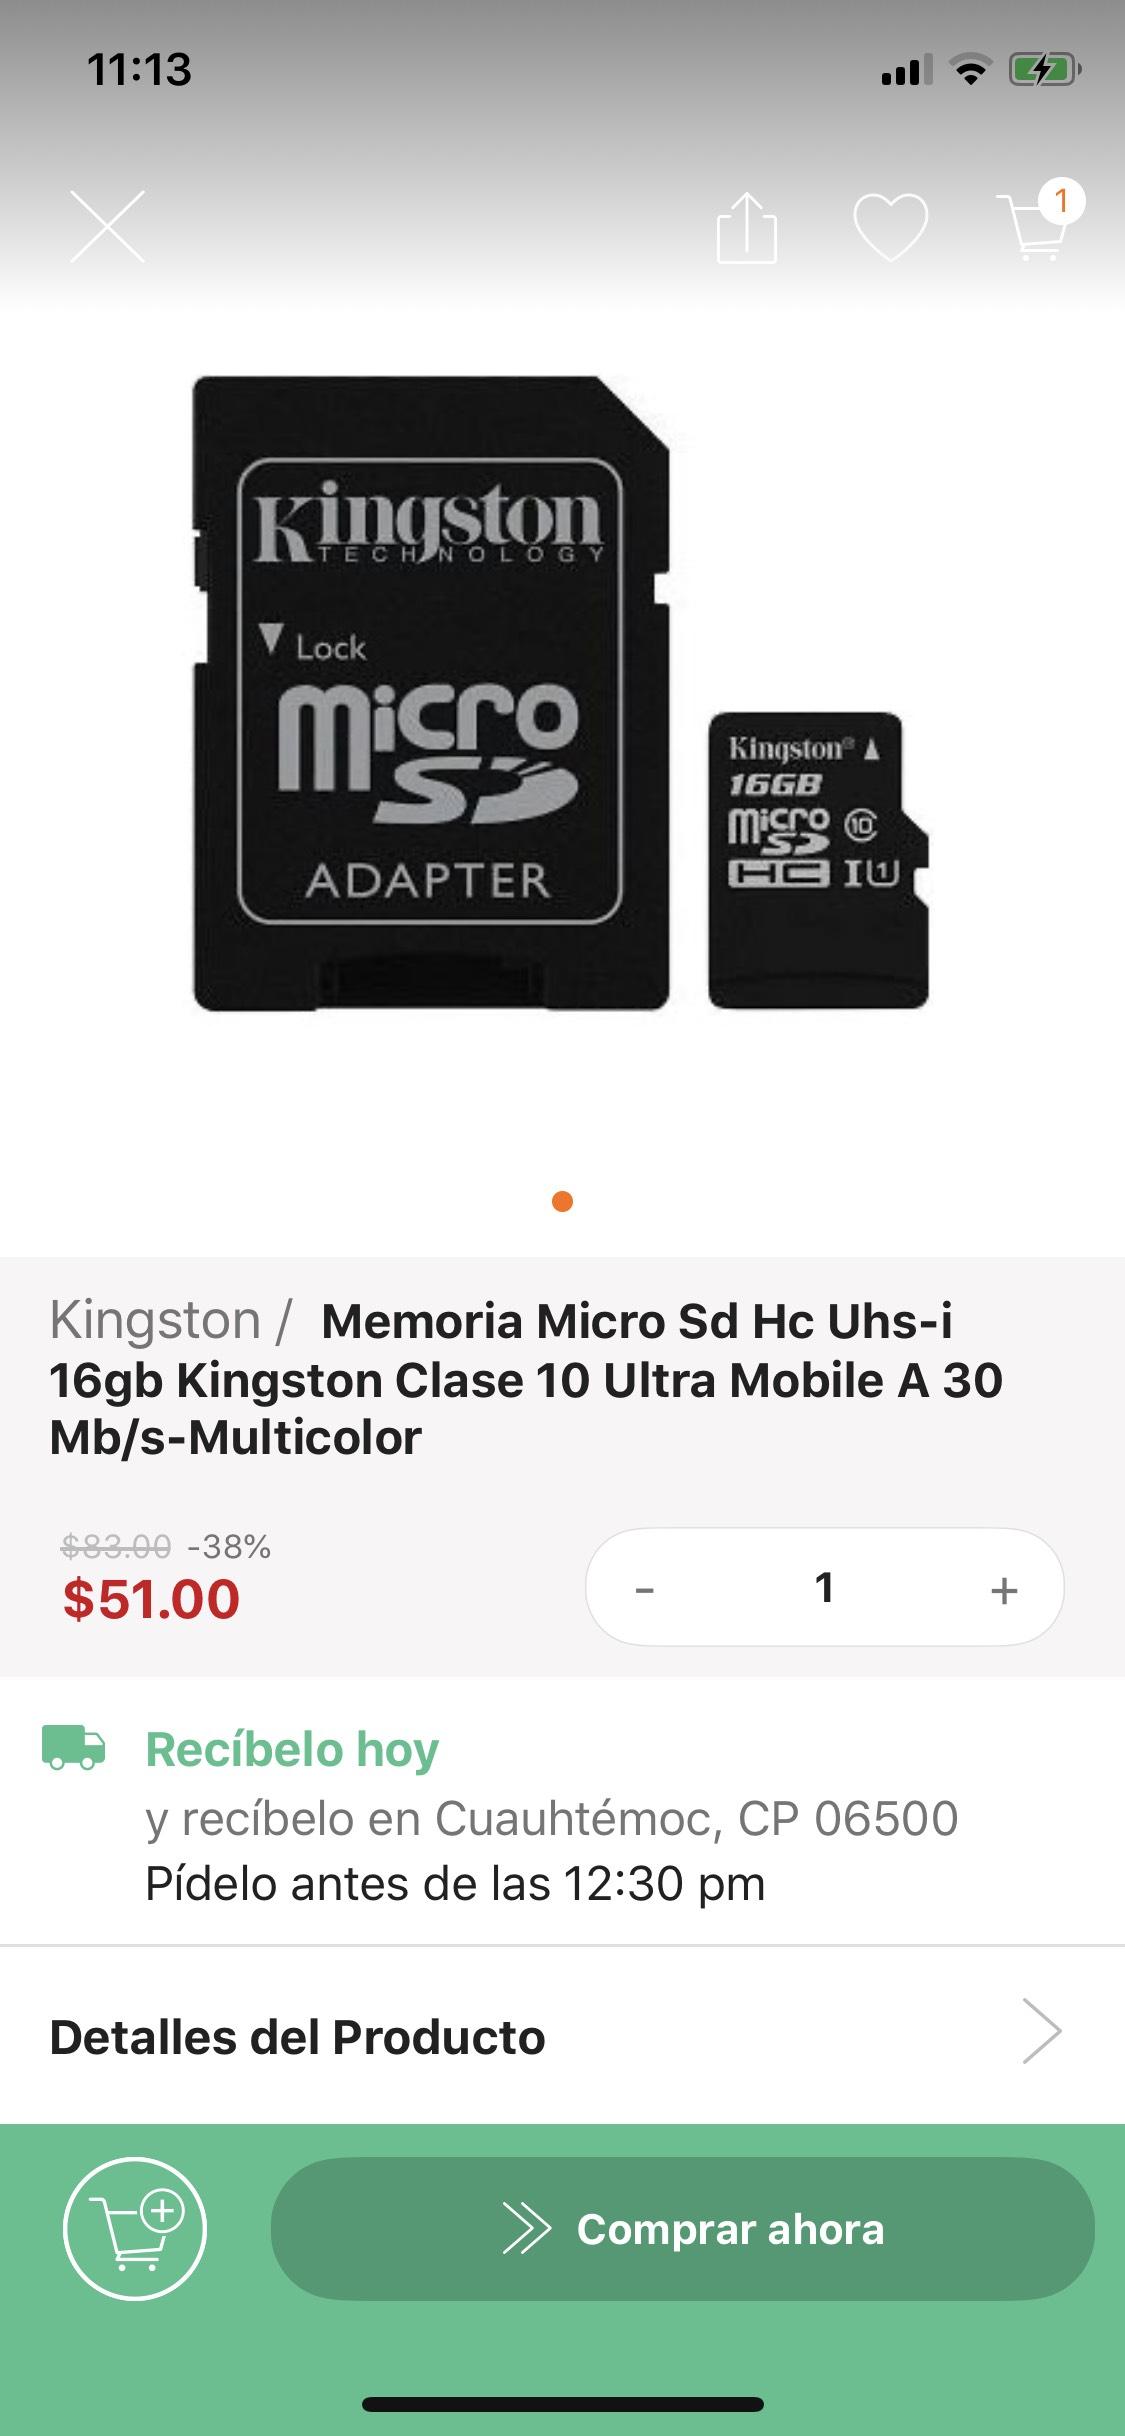 Linio Micro SD kington 16 gb